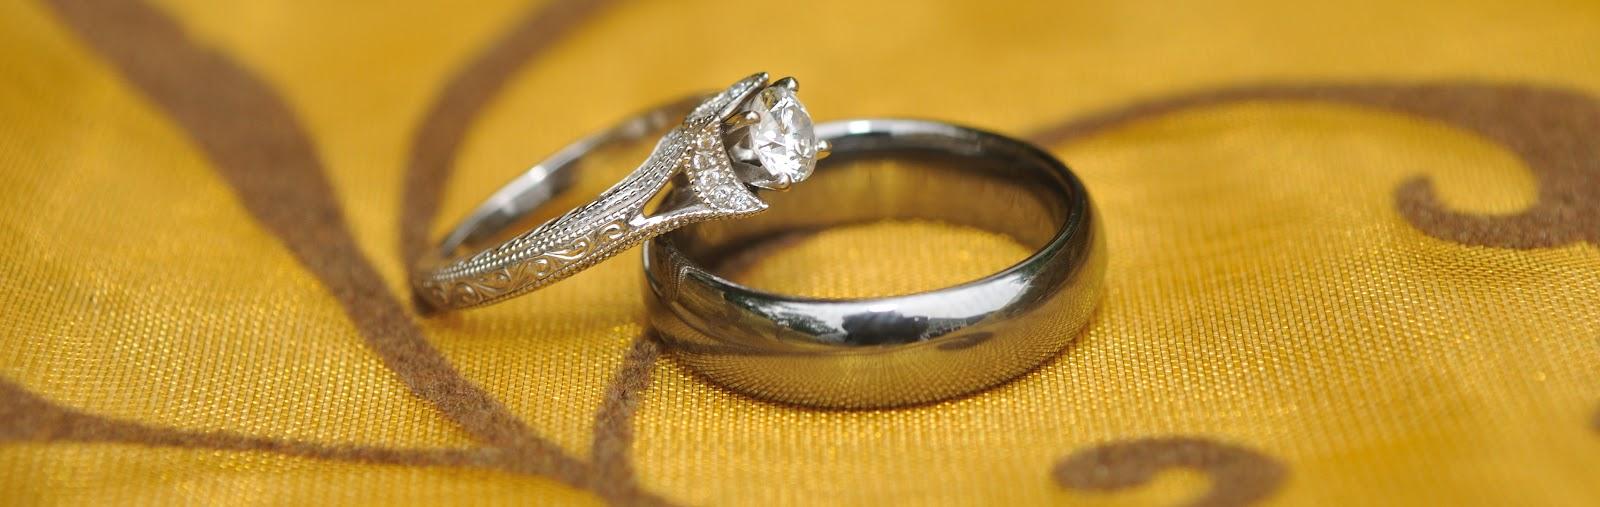 One Year Wedding Anniversary Elisabeth Mcknight